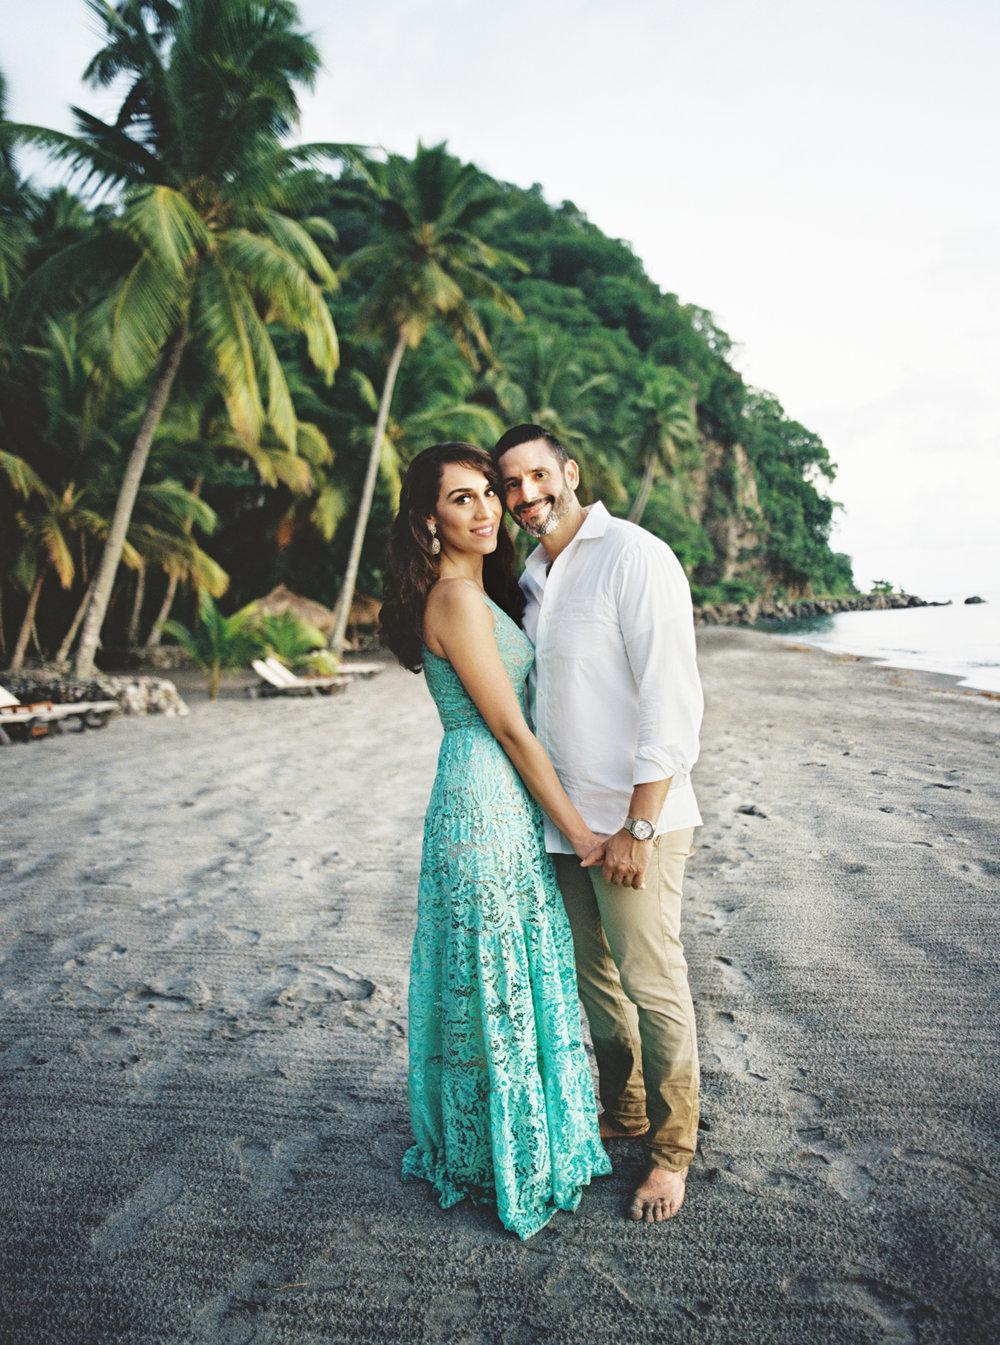 050Delmary's & Daniel : Engagement Photos : St. Lucia : Carribean : Elopement : Outlive Creative : 2016.jpg